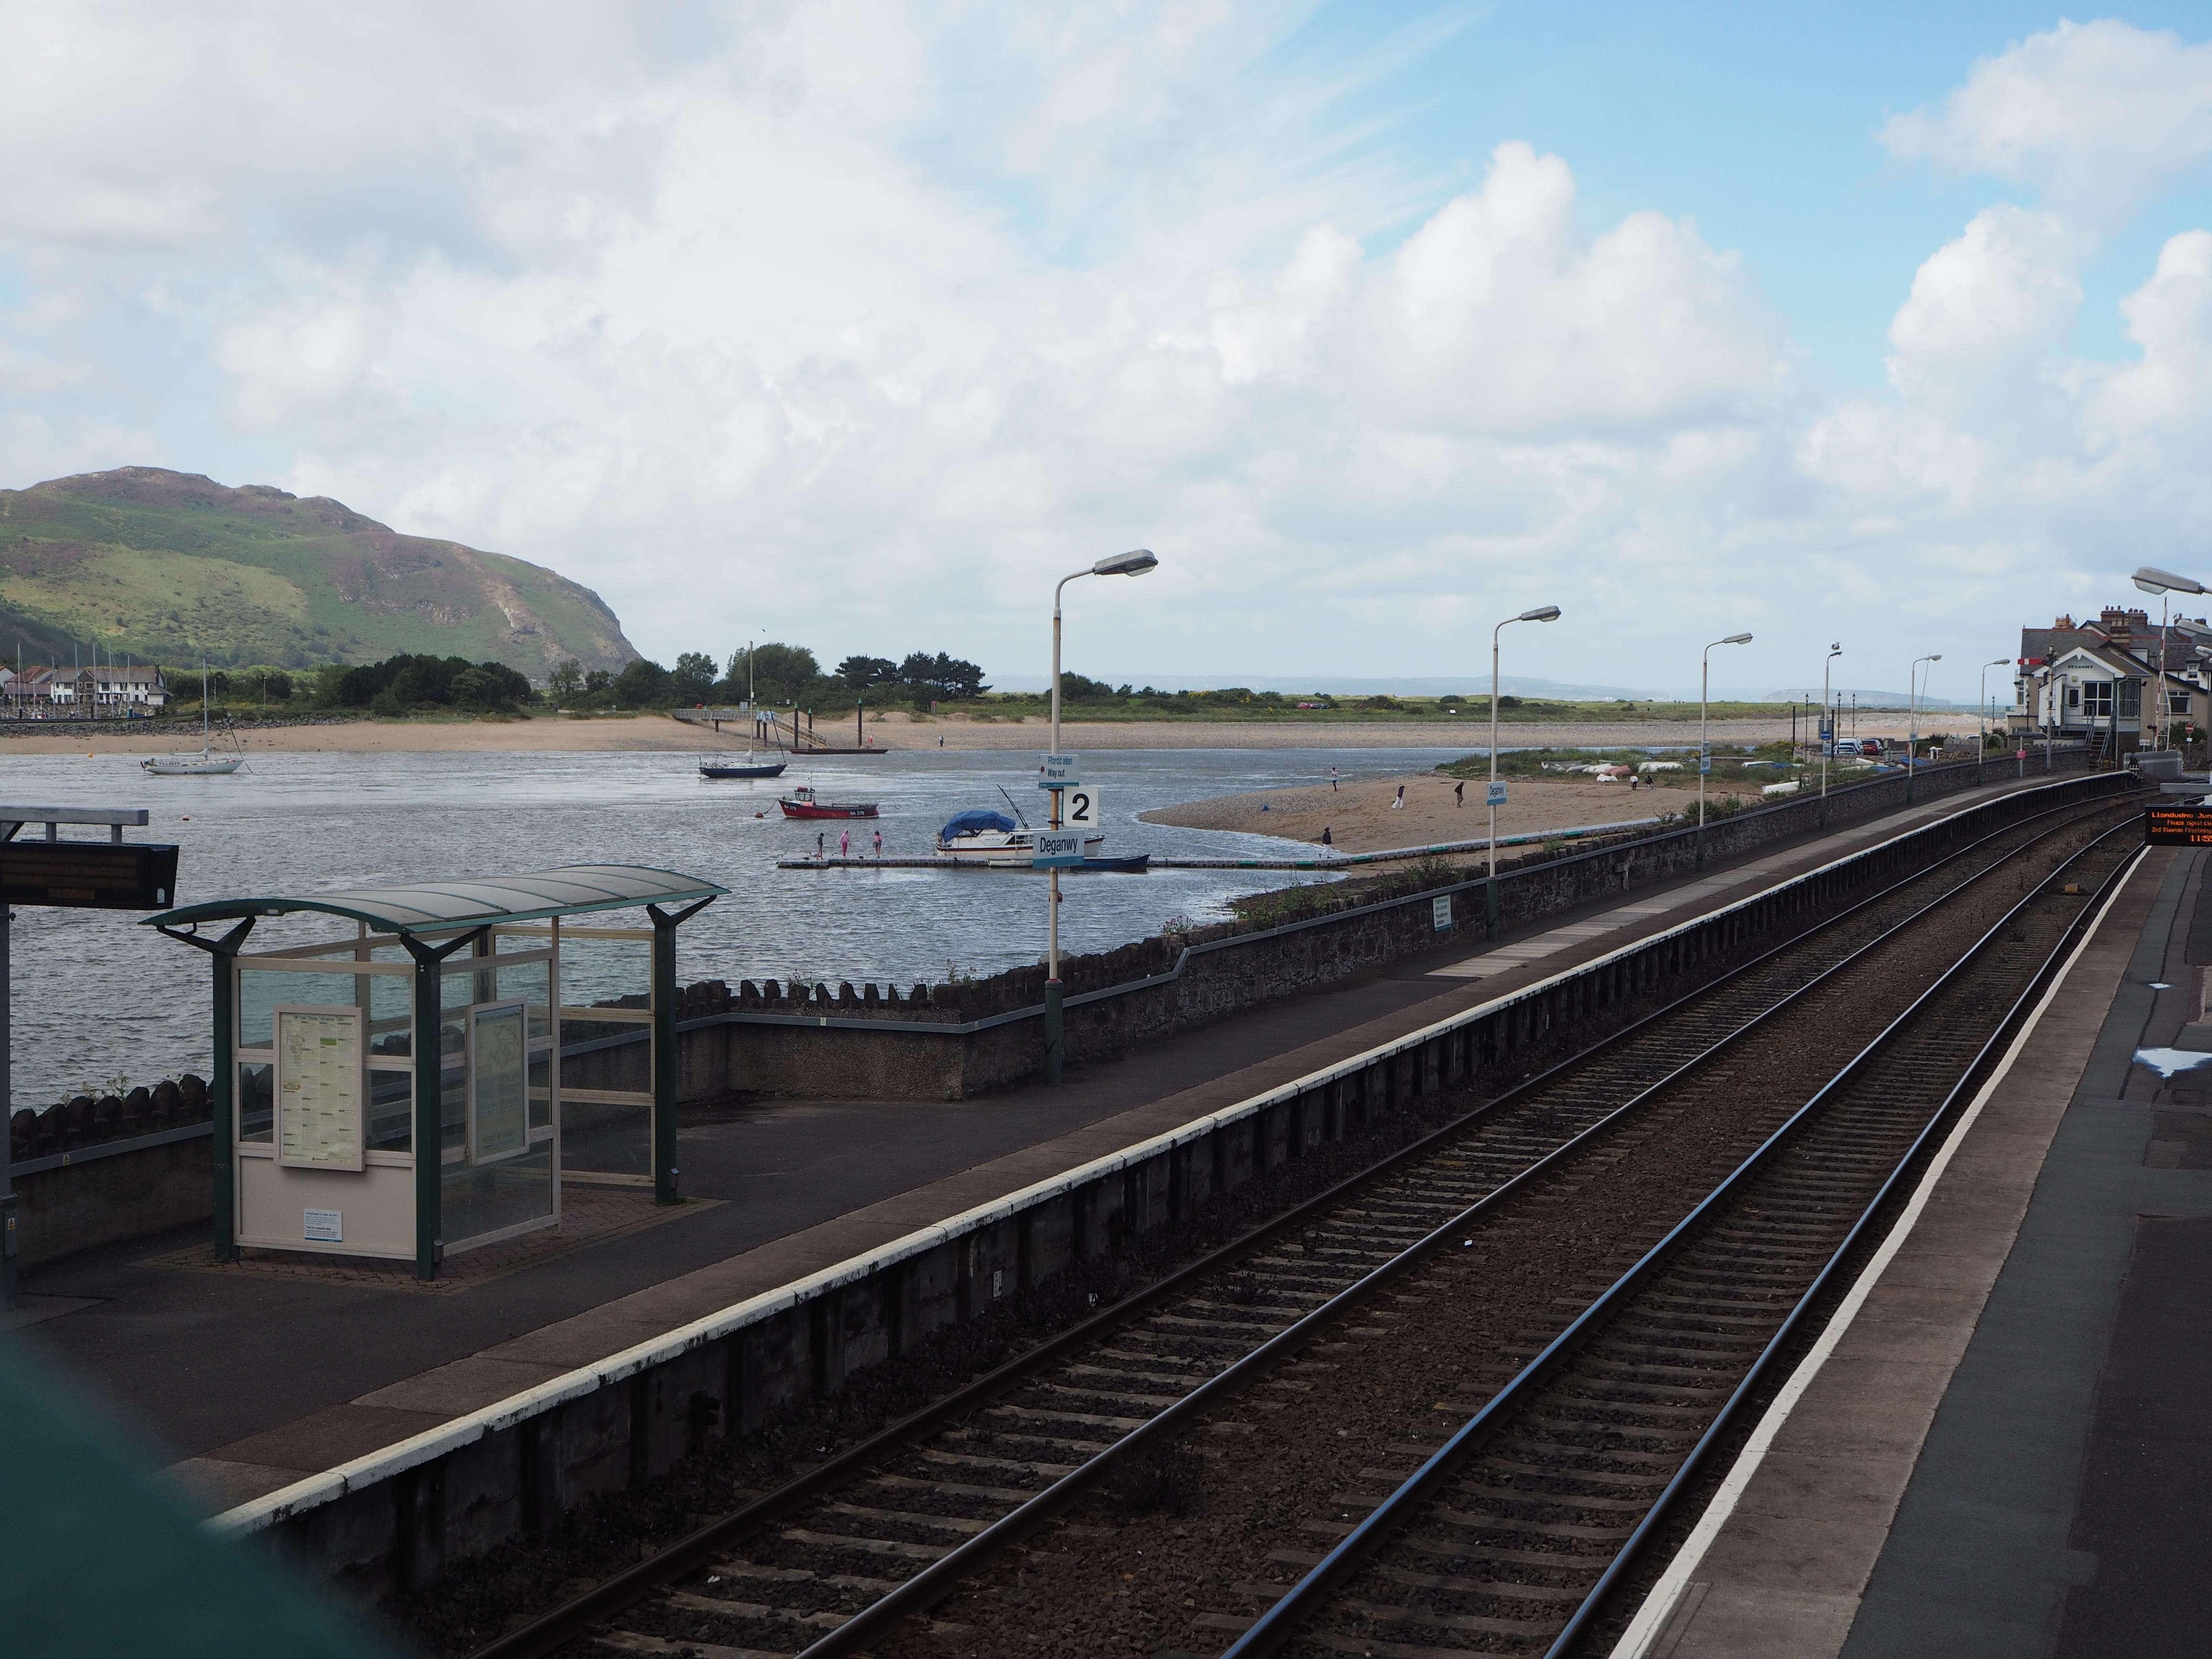 Deganwy Station, Conwy Valley Railway